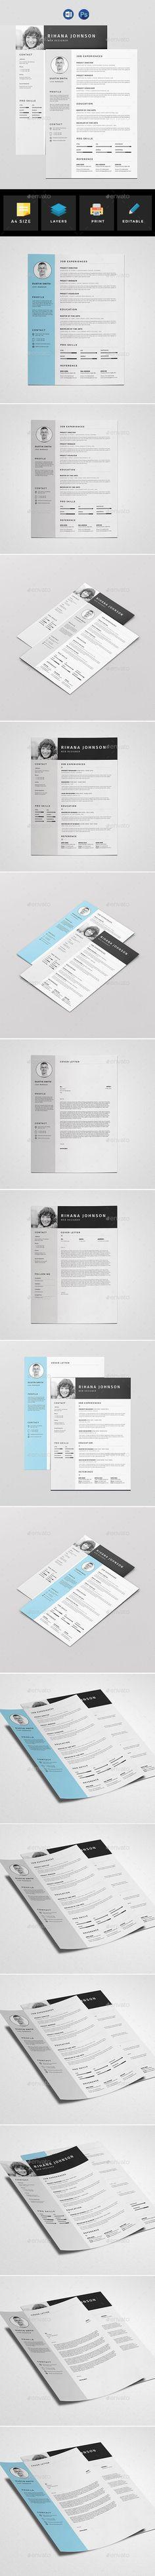 Resume Resume cover letters Resume